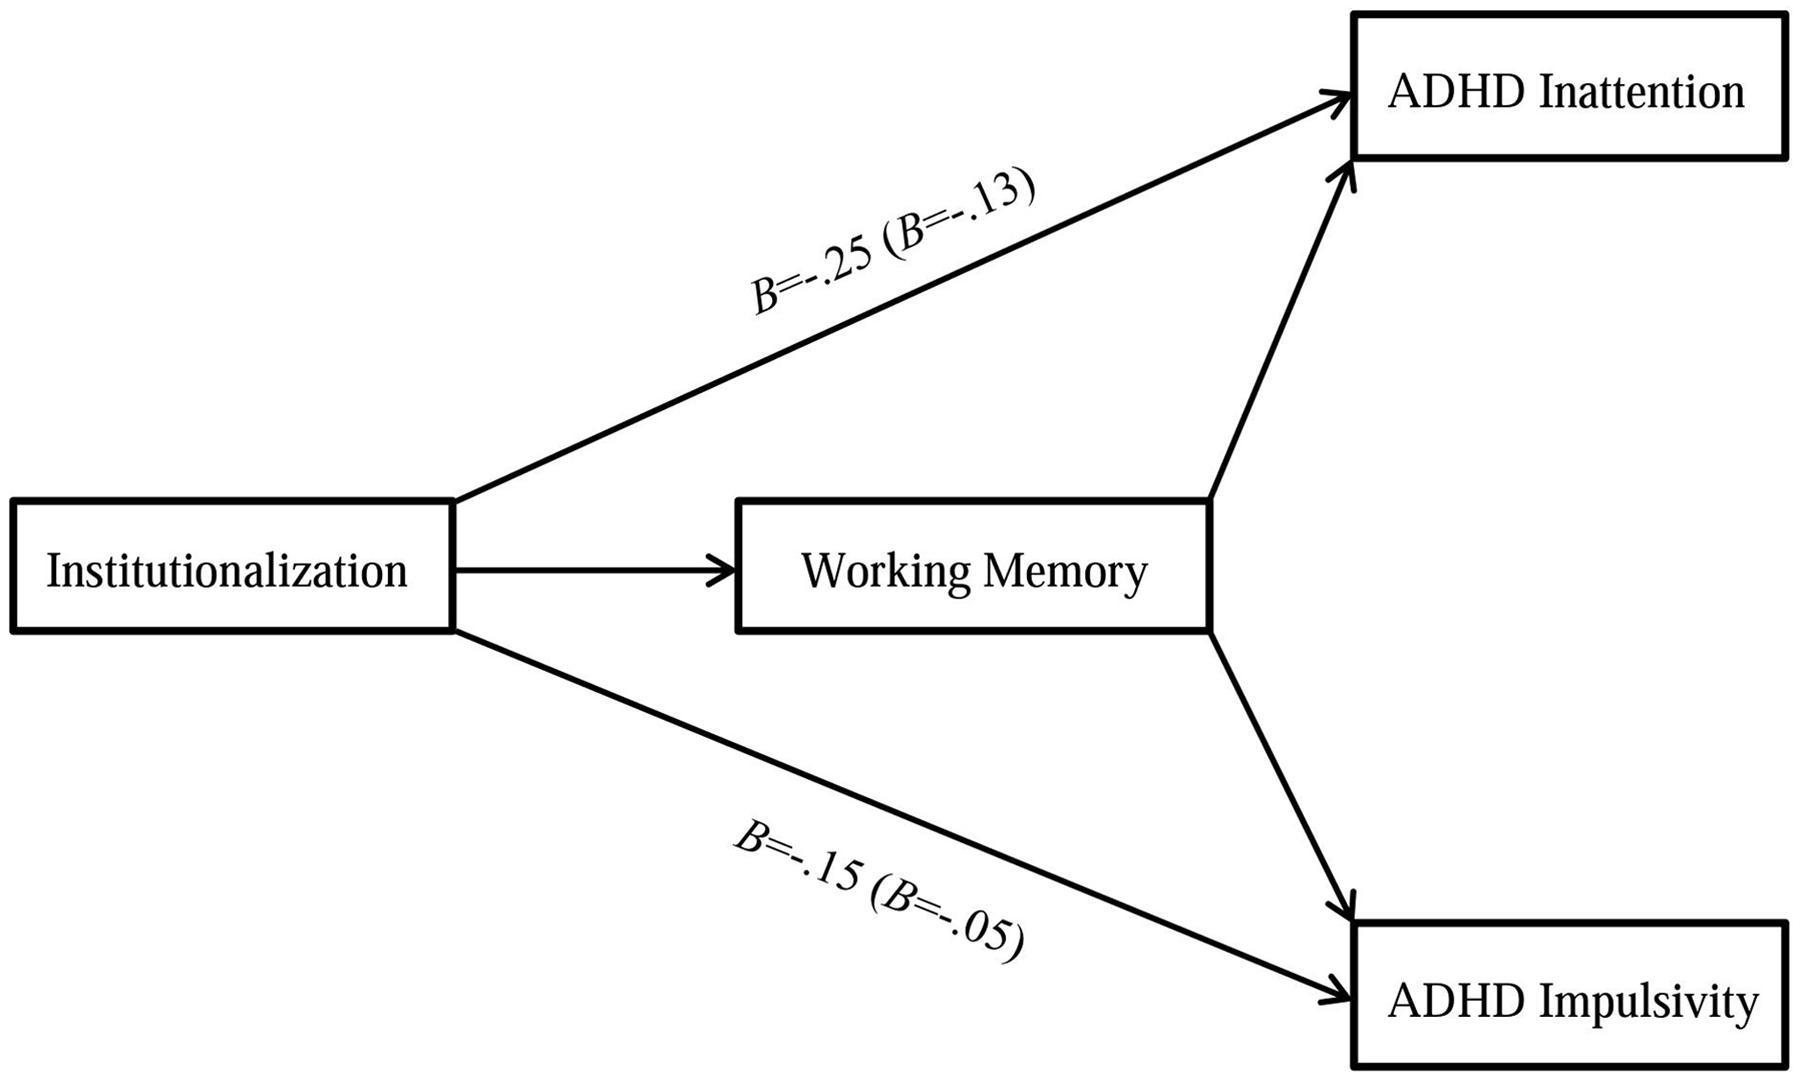 Frontiers | Reduced Working Memory Mediates the Link between